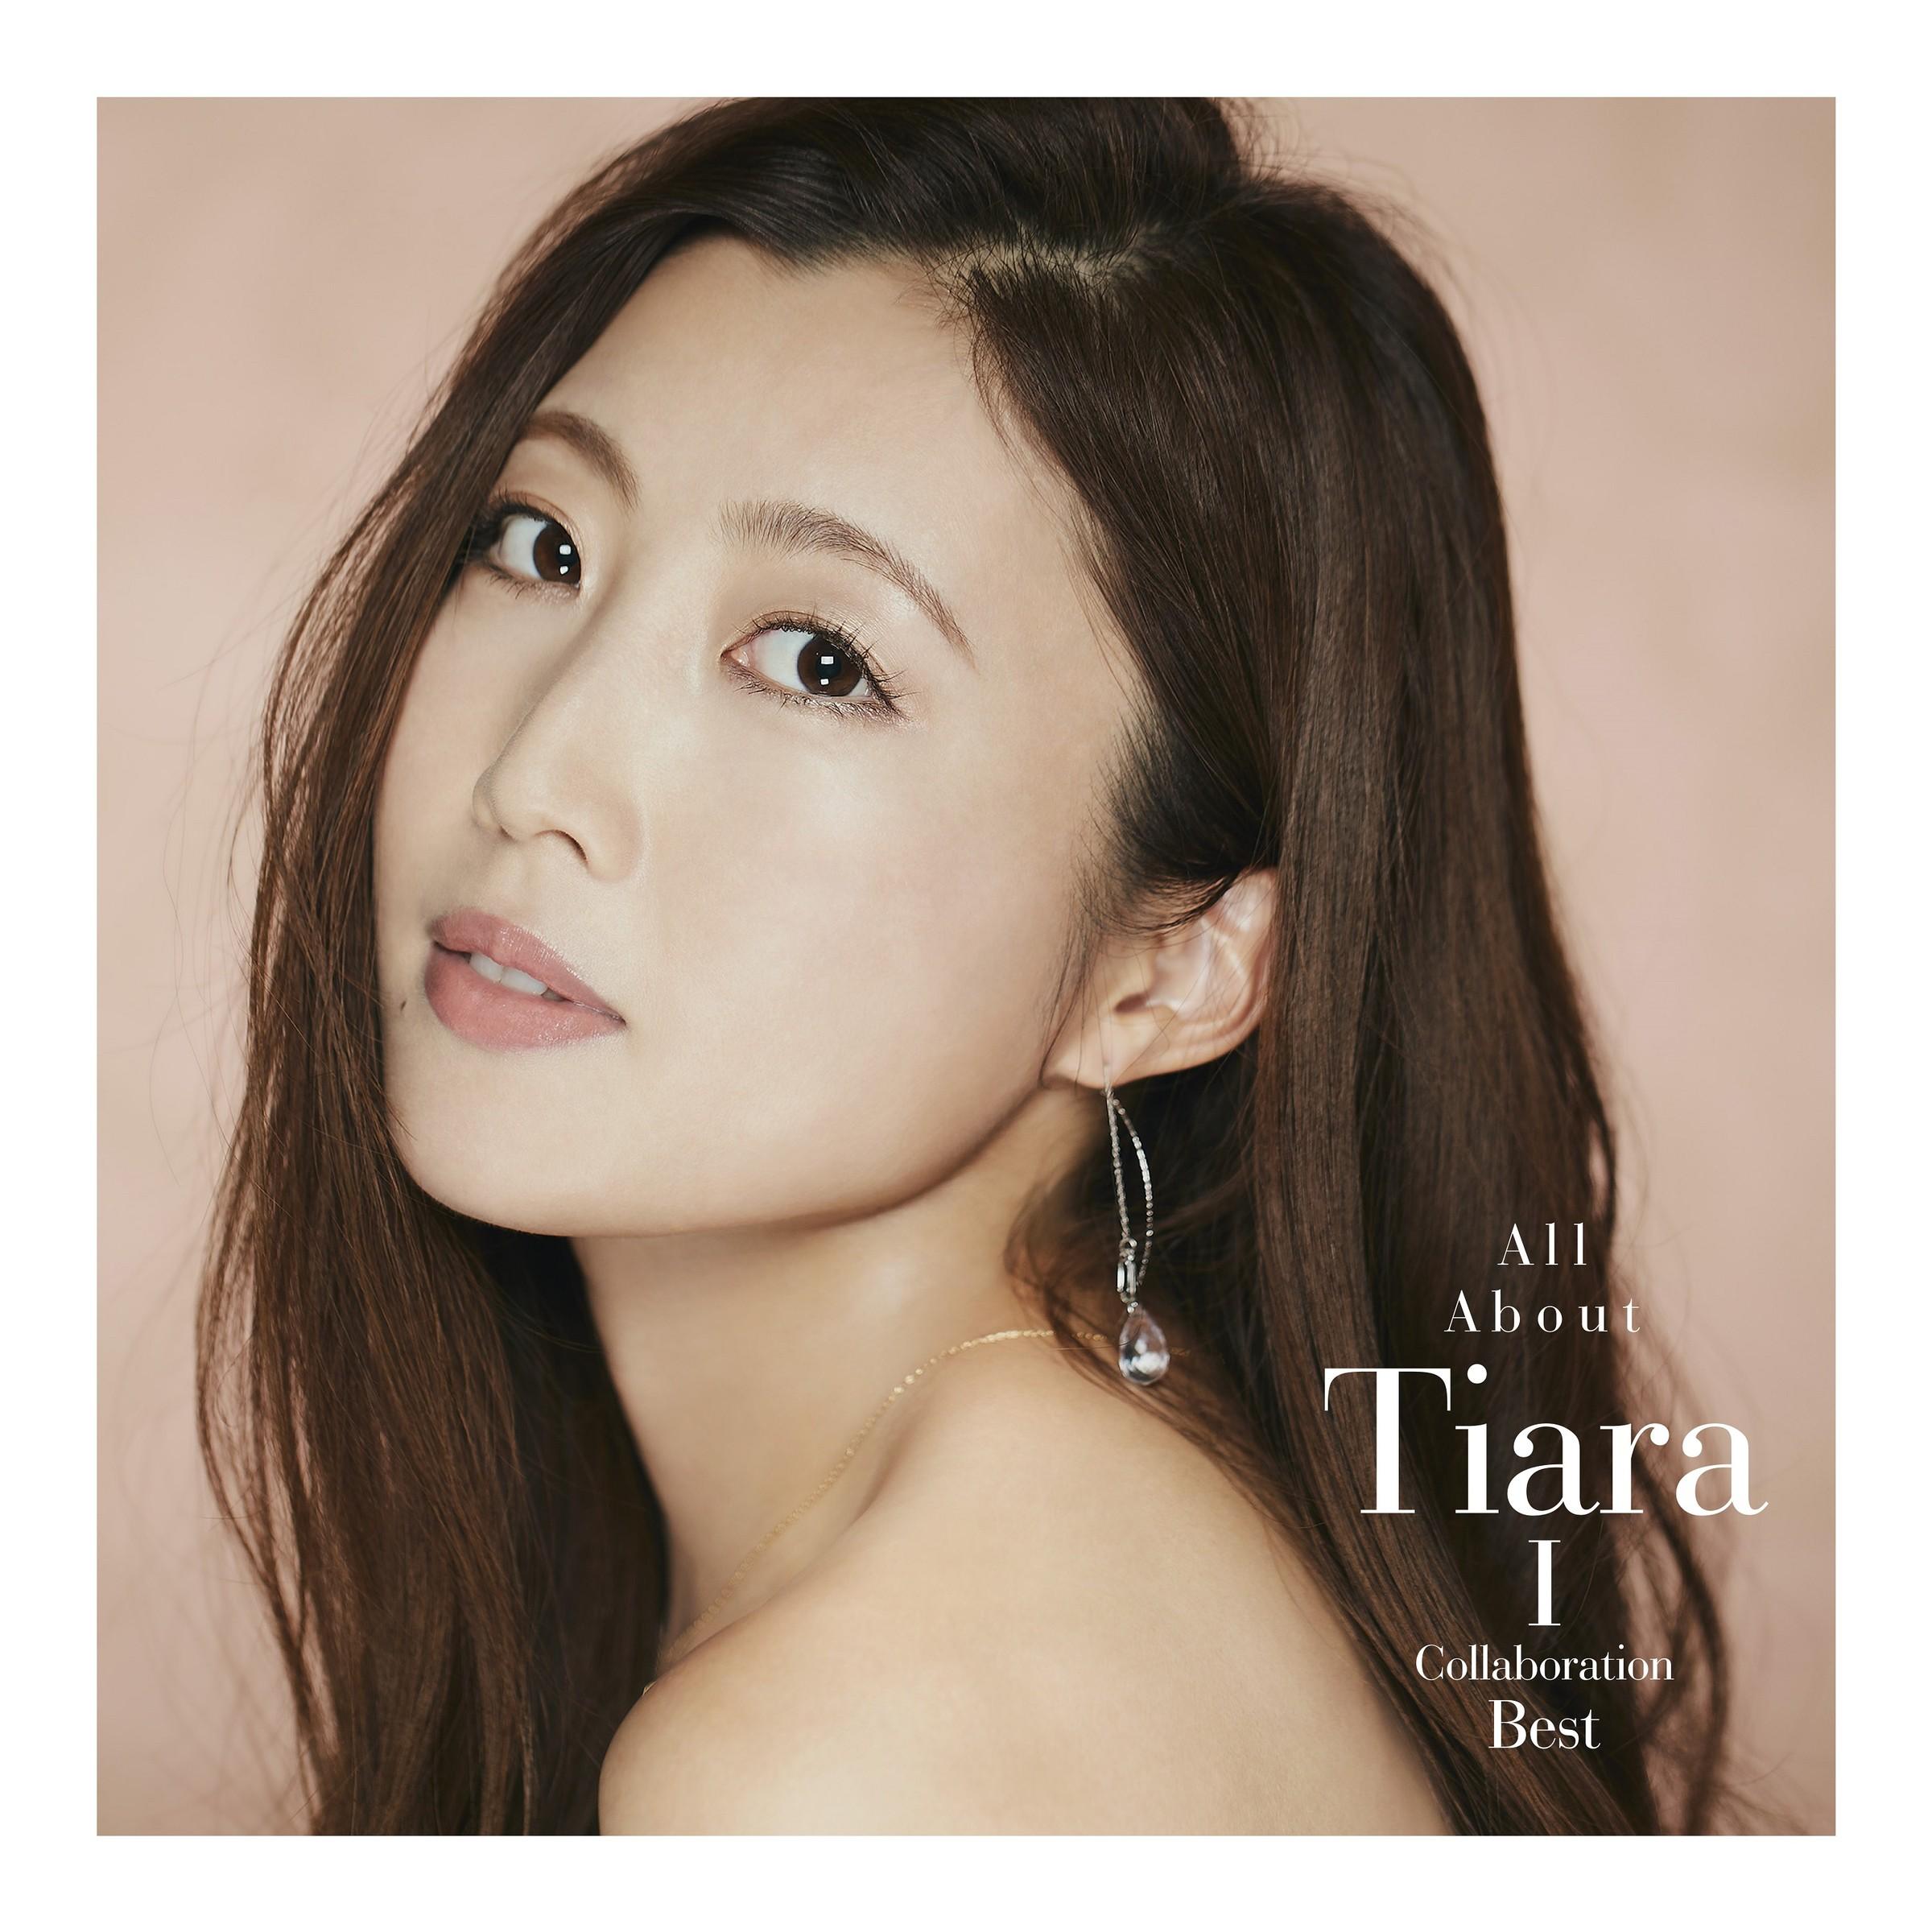 [Album] Tiara – All About Tiara Ⅰ / Collaboration Best [FLAC / WEB] [2020.10.07]